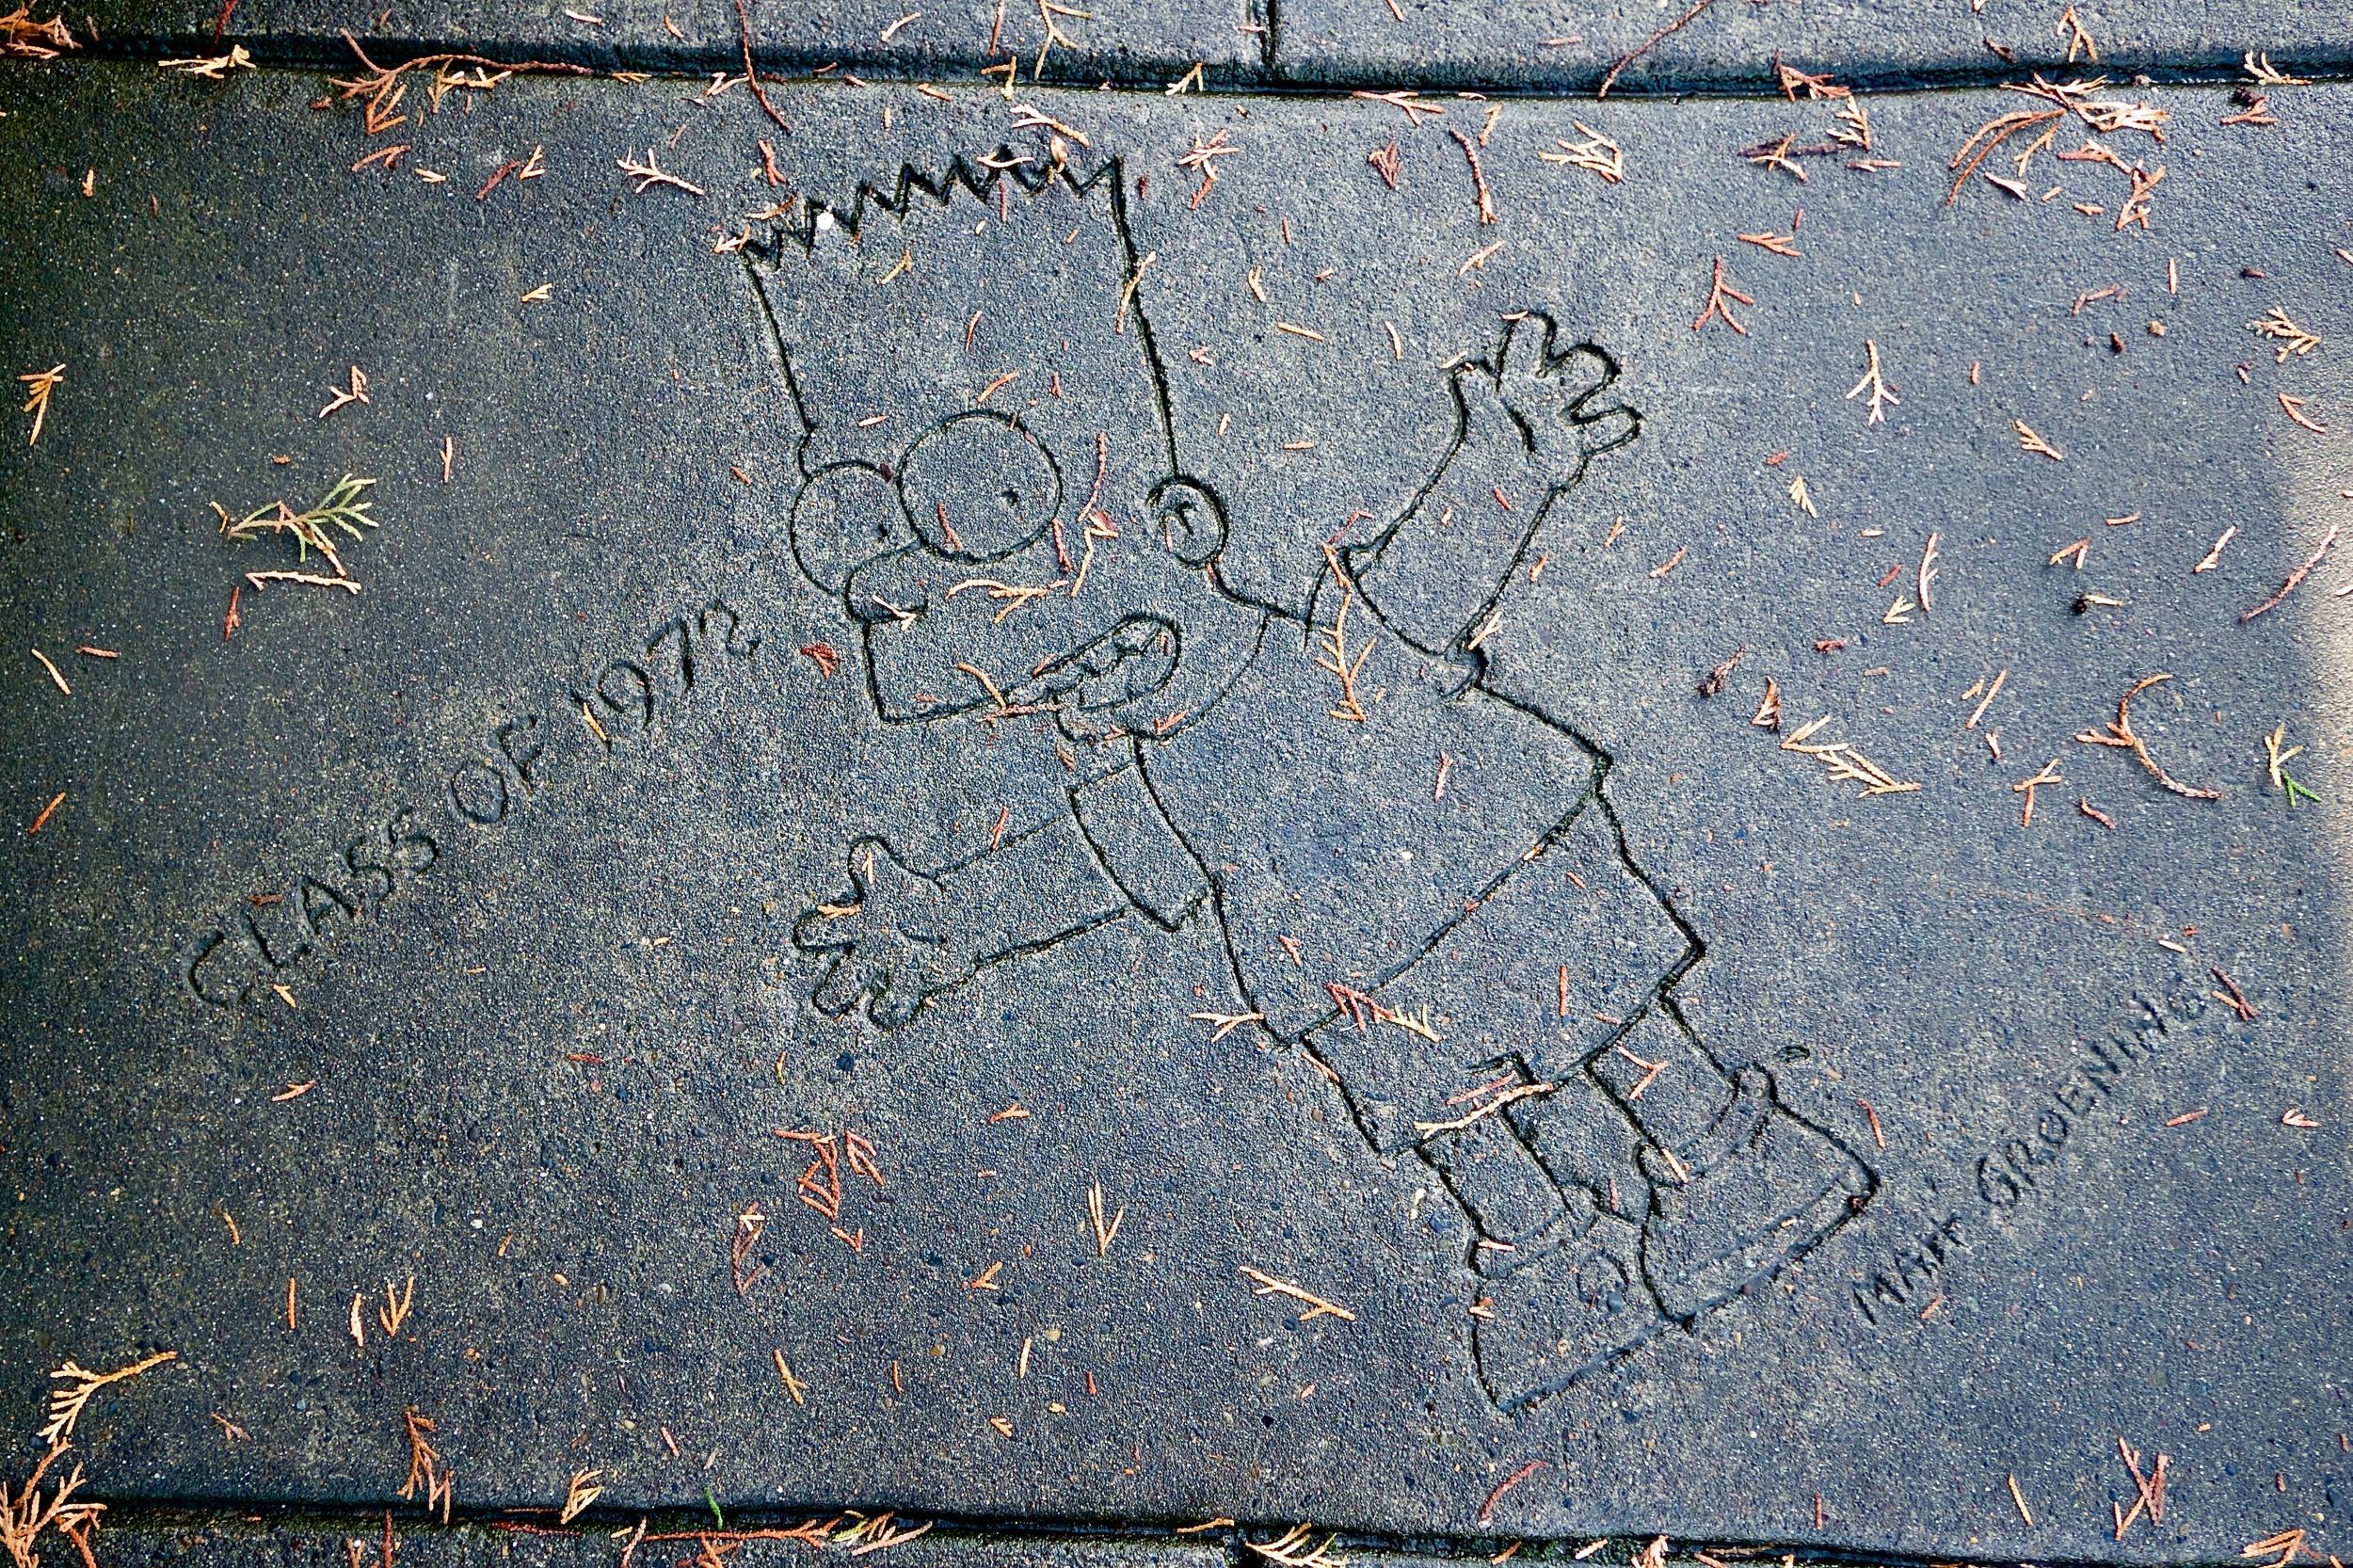 Drawing by Matt Groening in the sidewalk by Lincoln High School